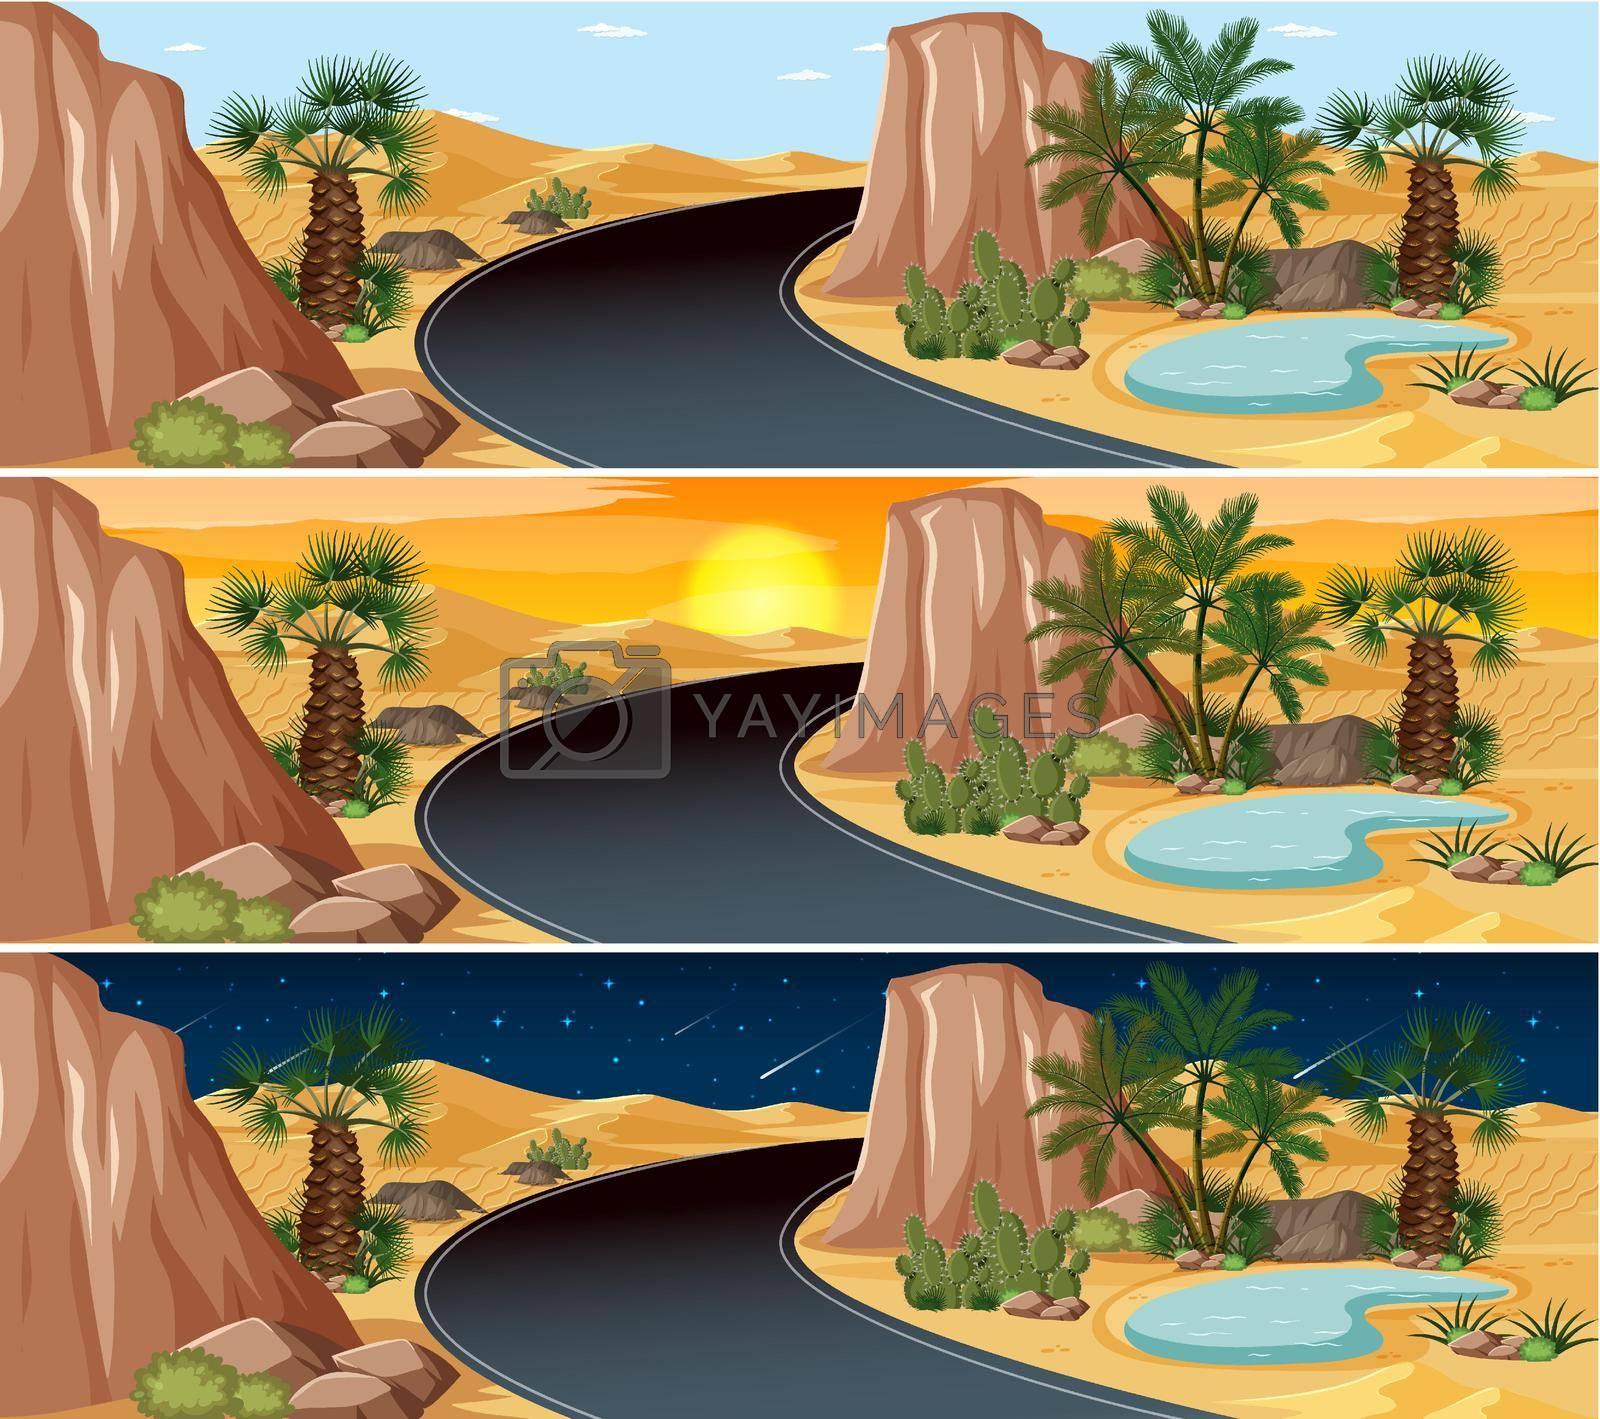 Desert nature landscape scene at different times of day illustration